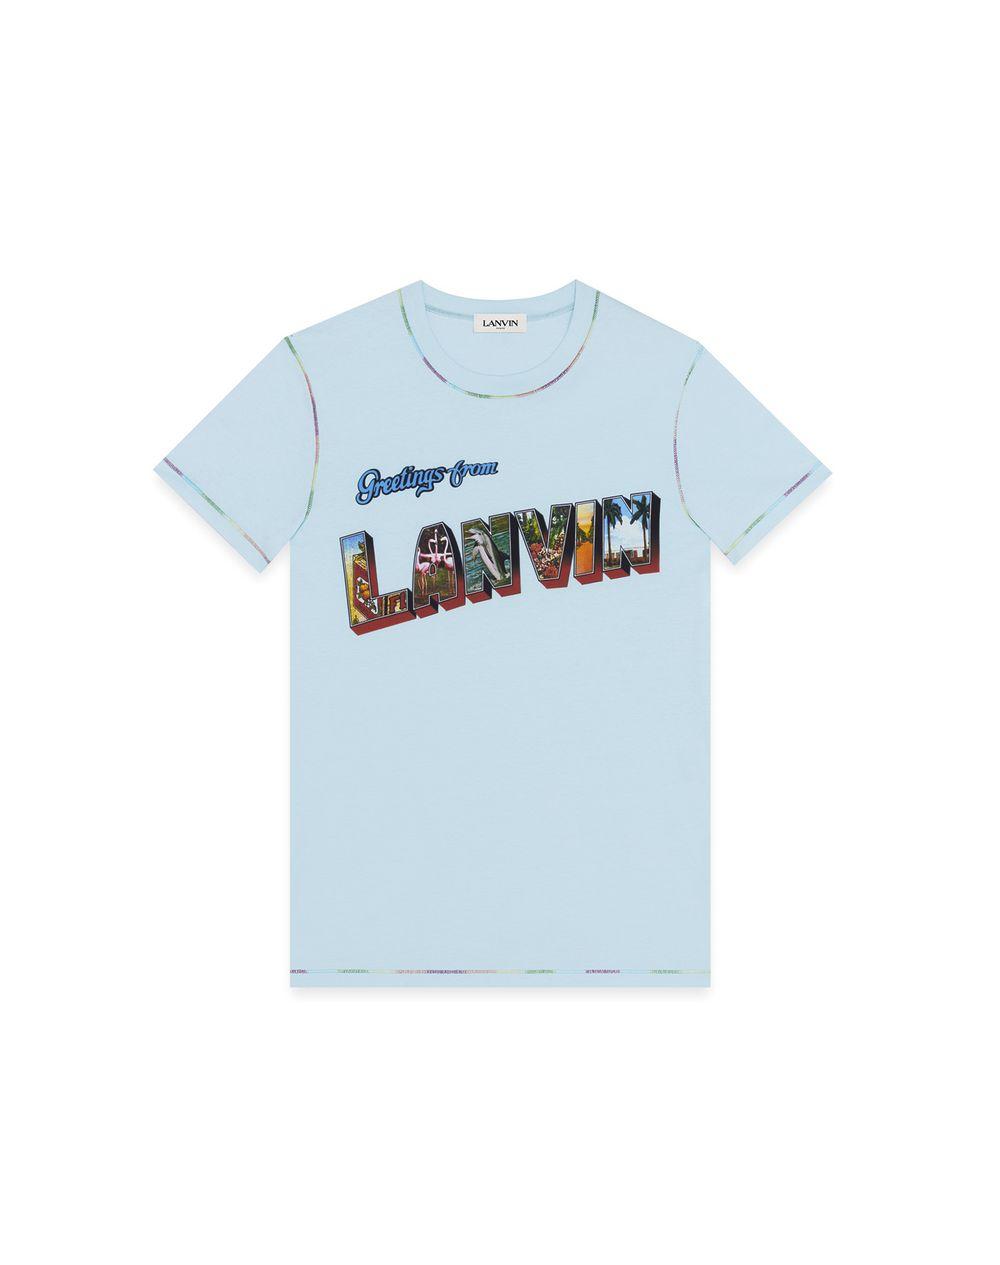 LANVIN PRINT T-SHIRT - Lanvin